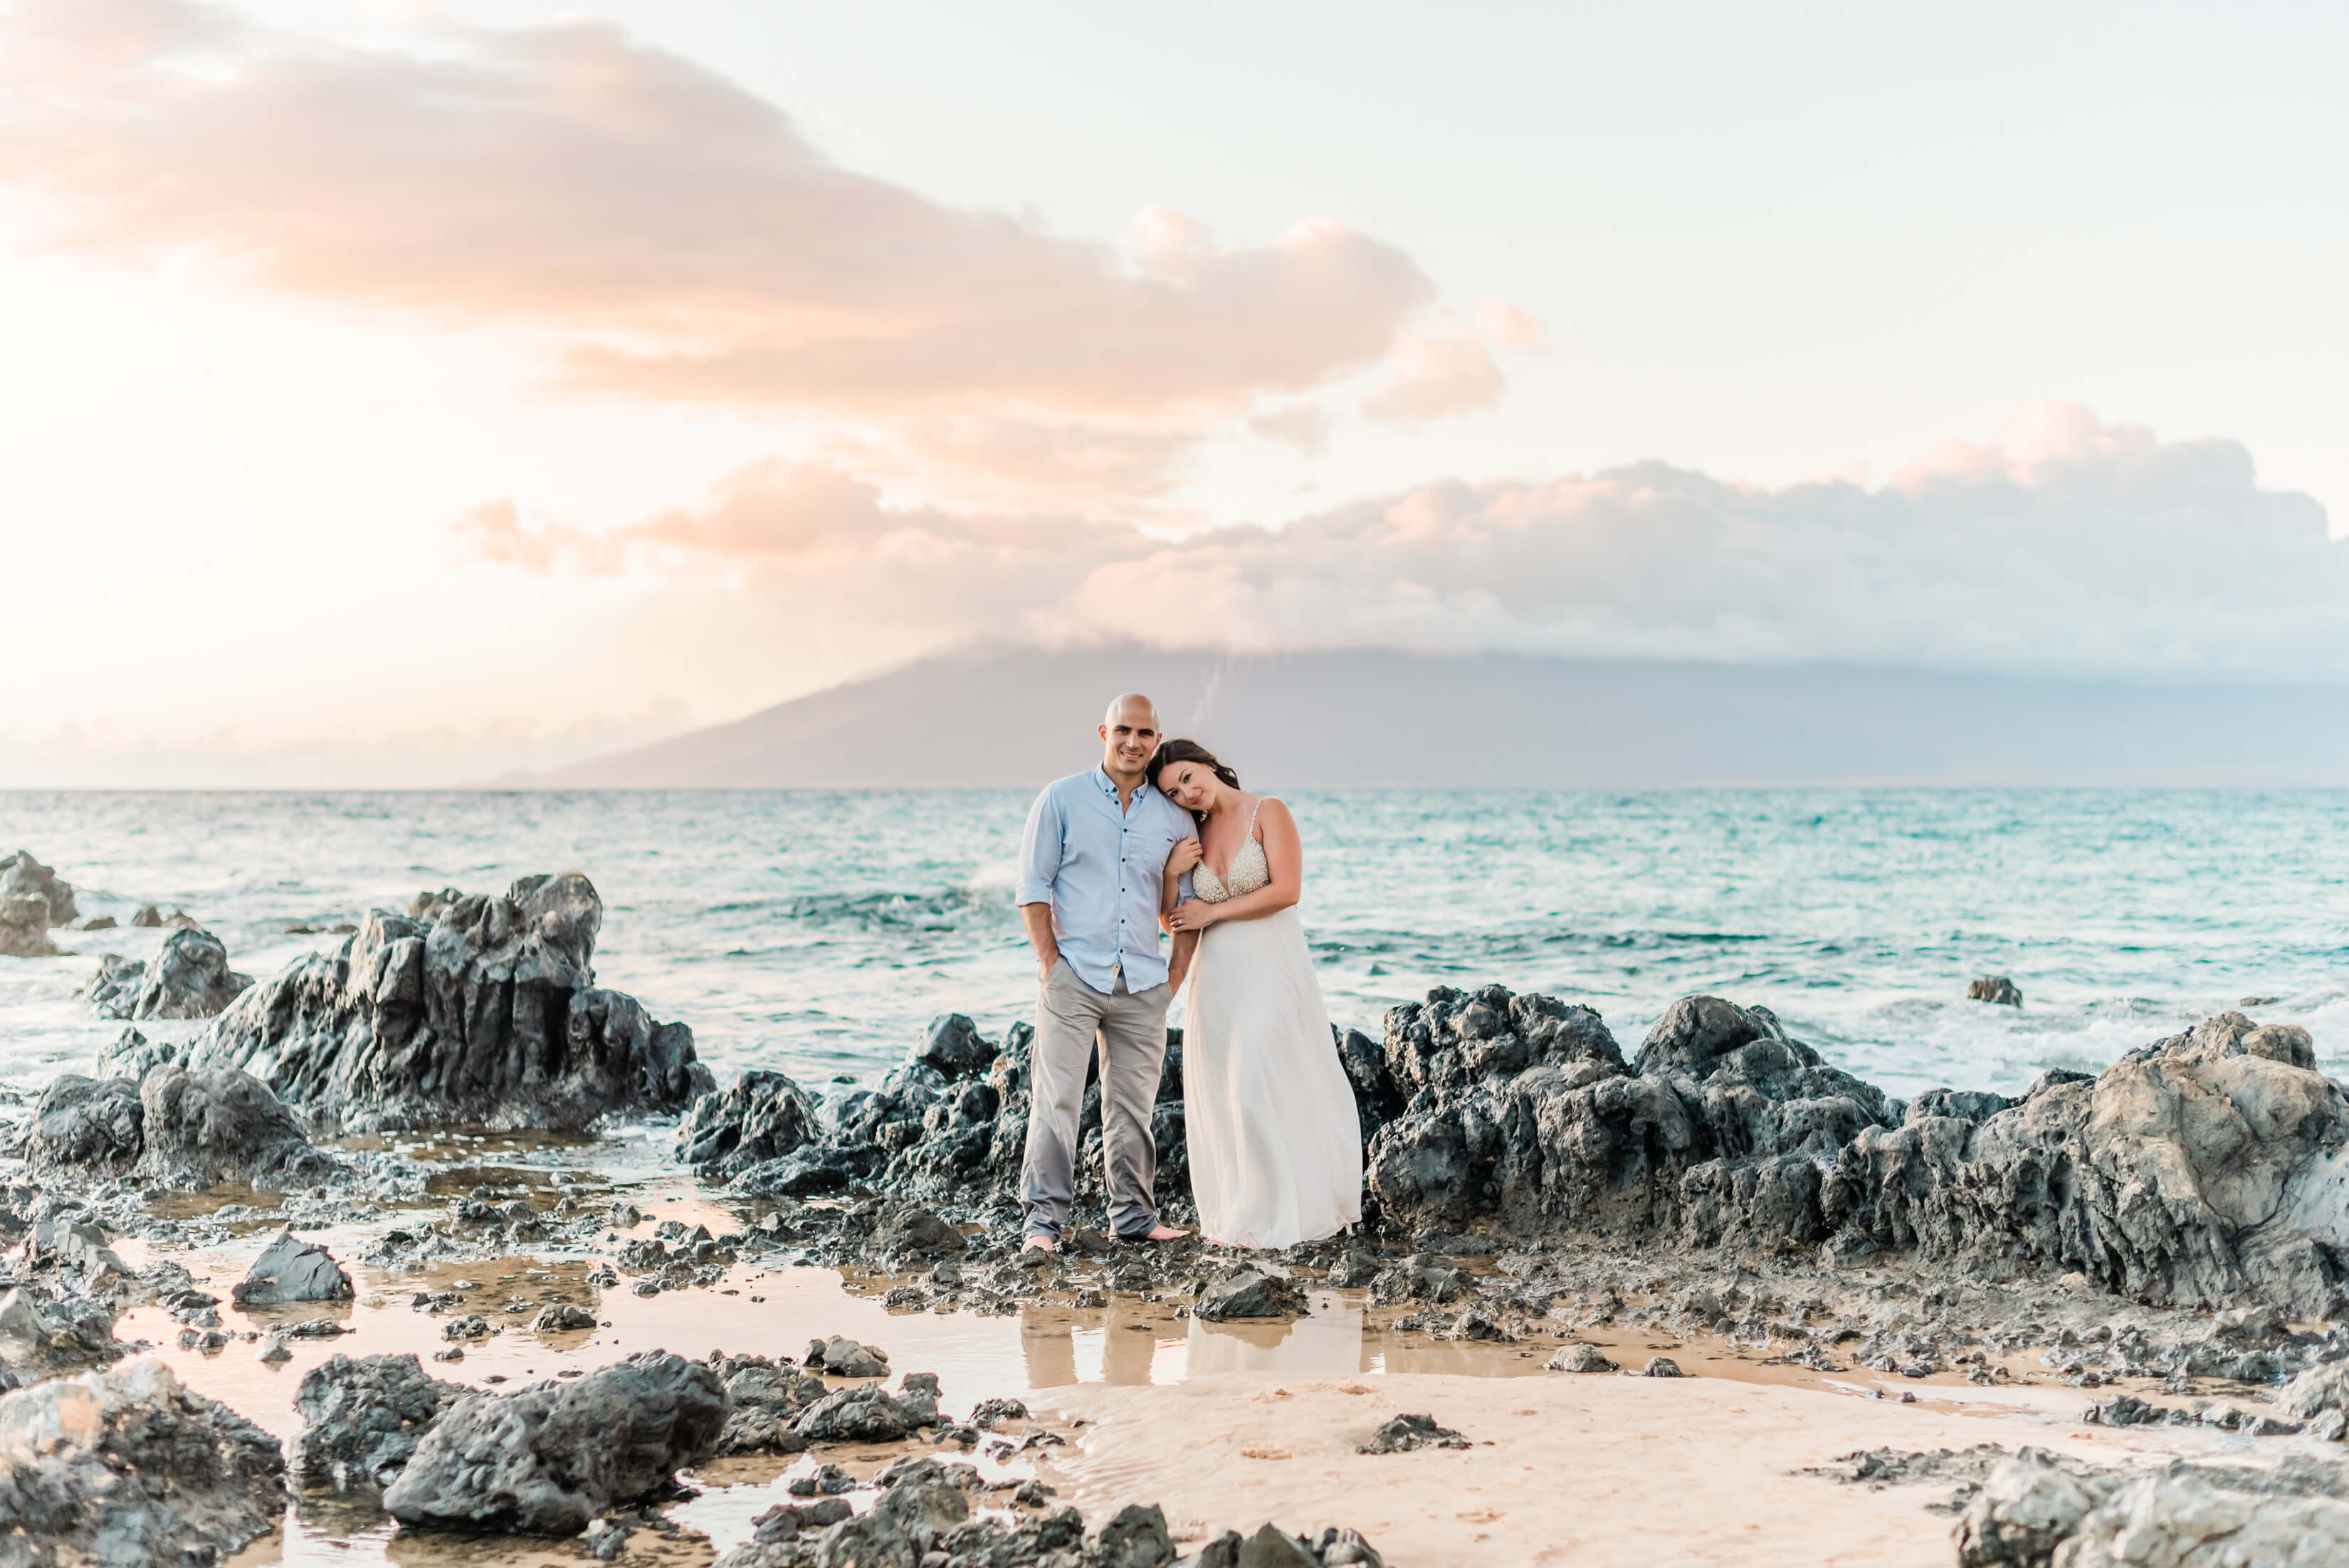 couple standing on the beach shoreline in Maui, Hawaii, USA